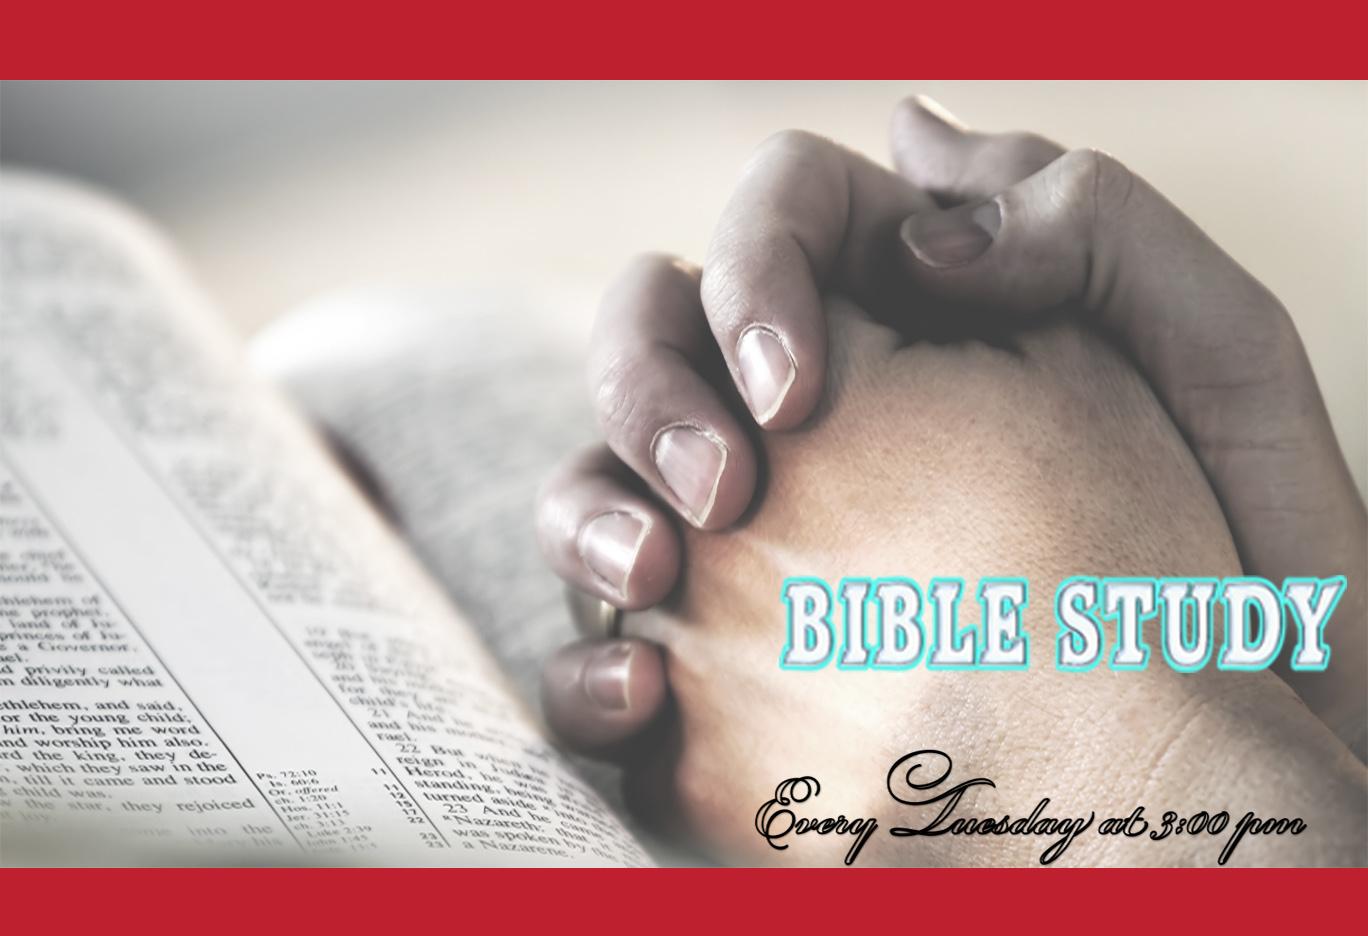 Bible Study Ministry Webpage 2018.jpg